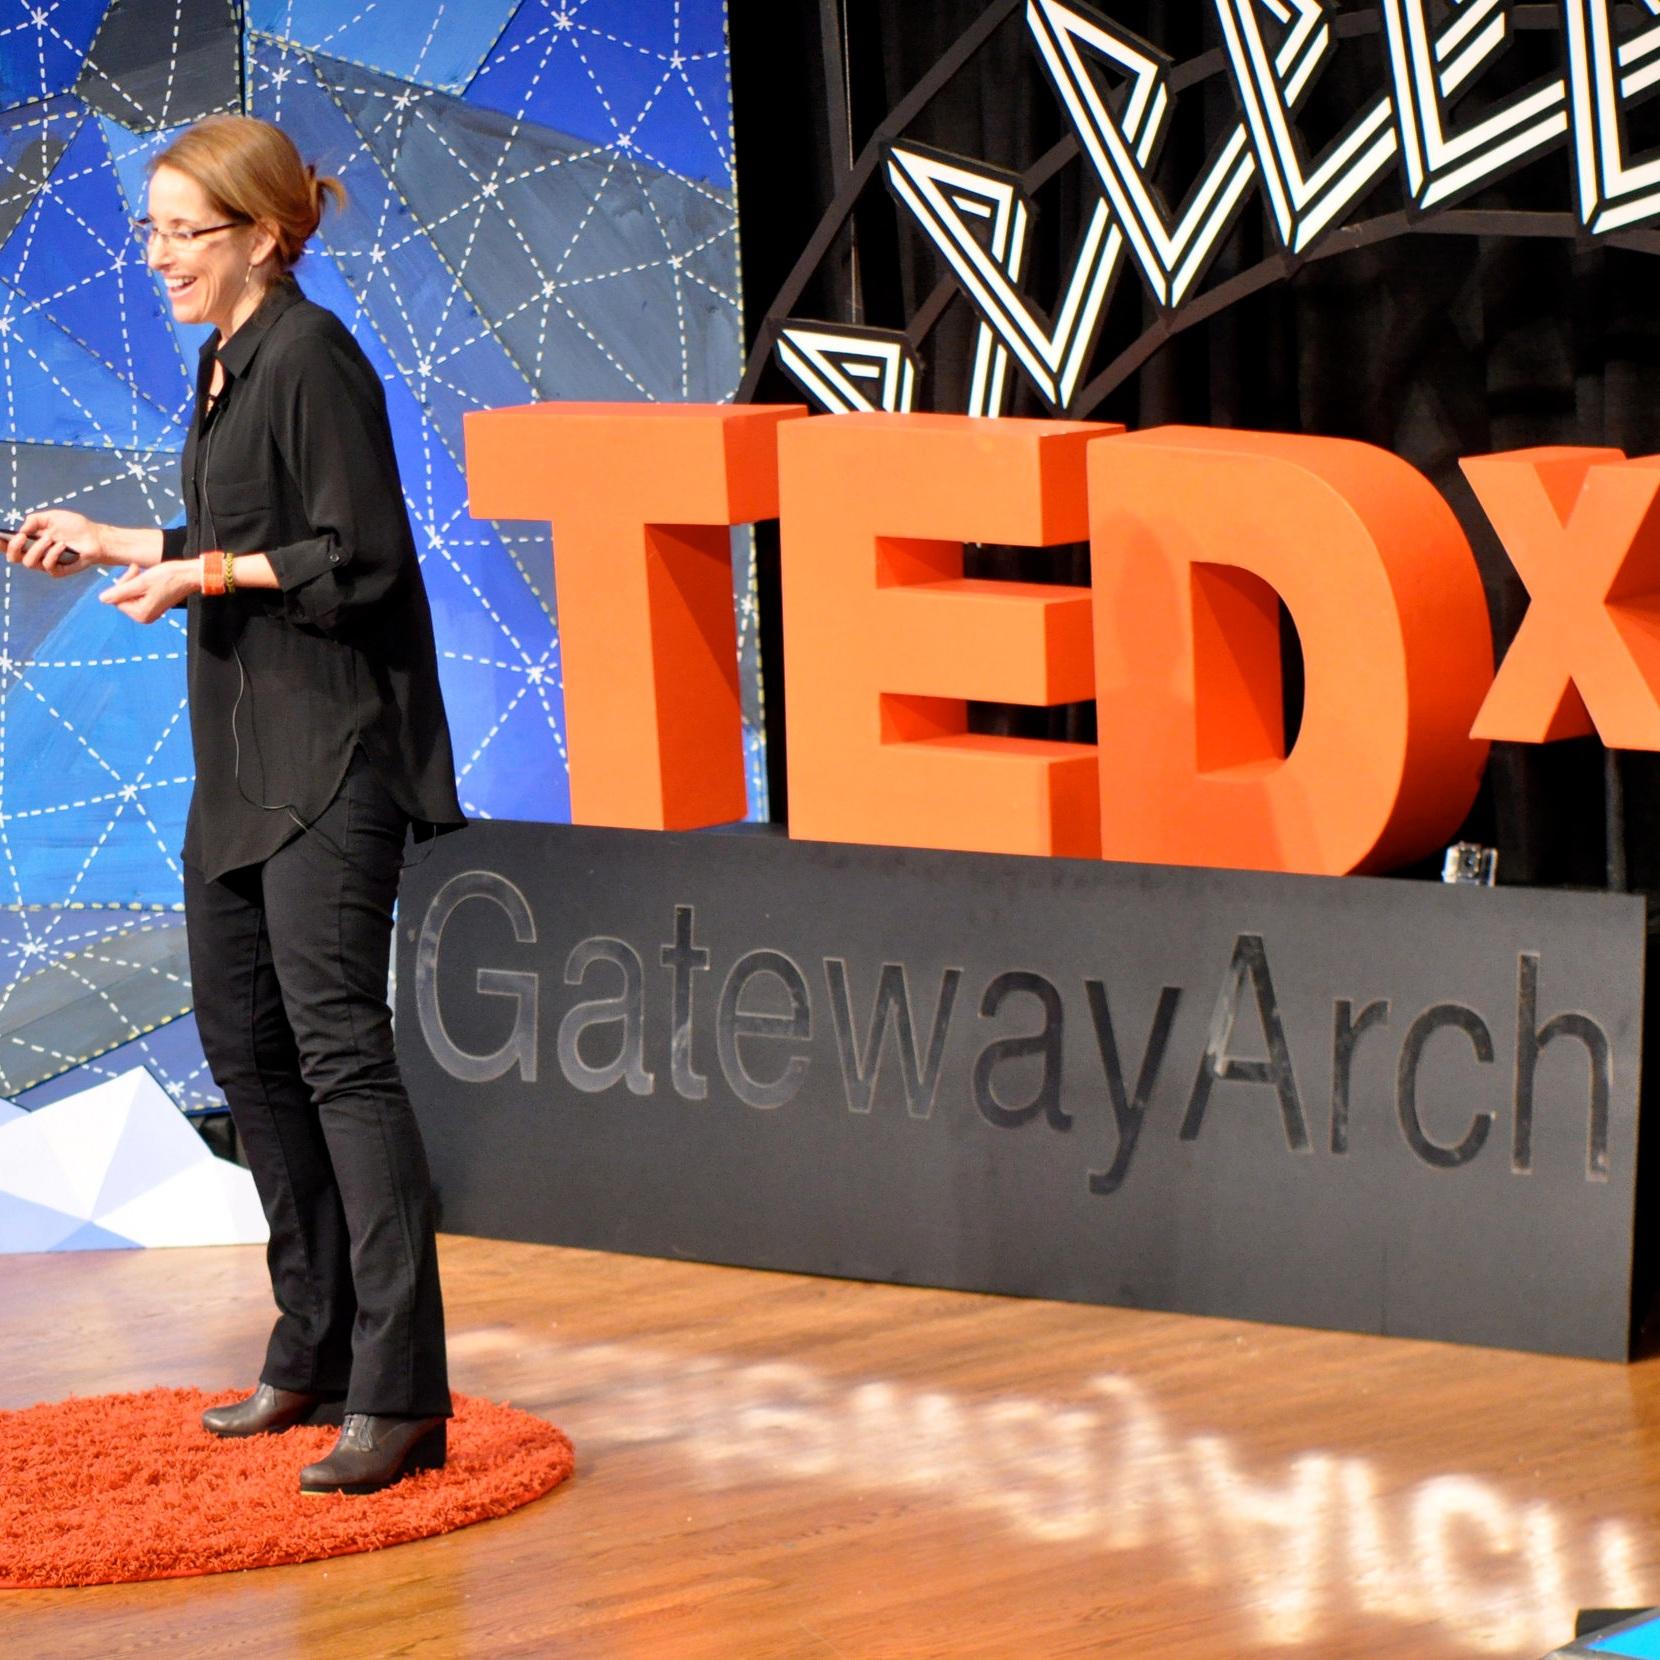 TEDxGateway142.jpg